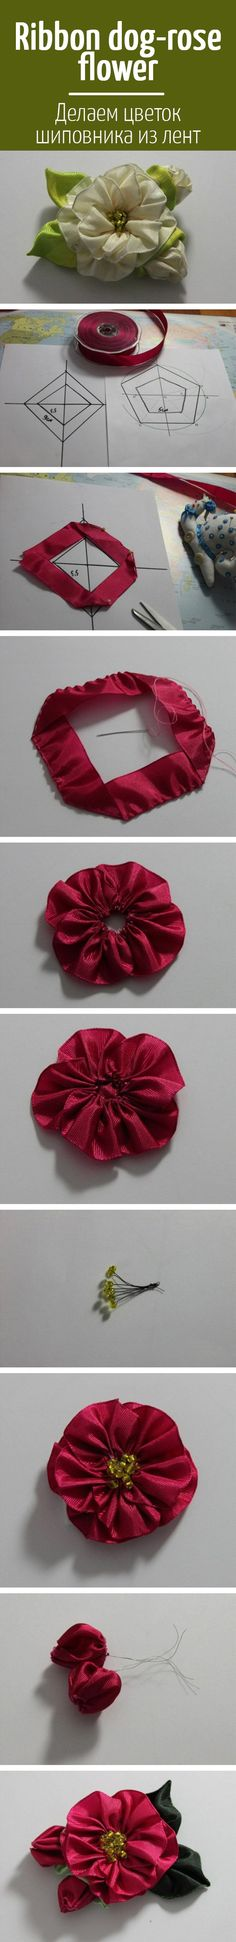 Ribbon dog-rose flower / Делаем цветок шиповника из лент